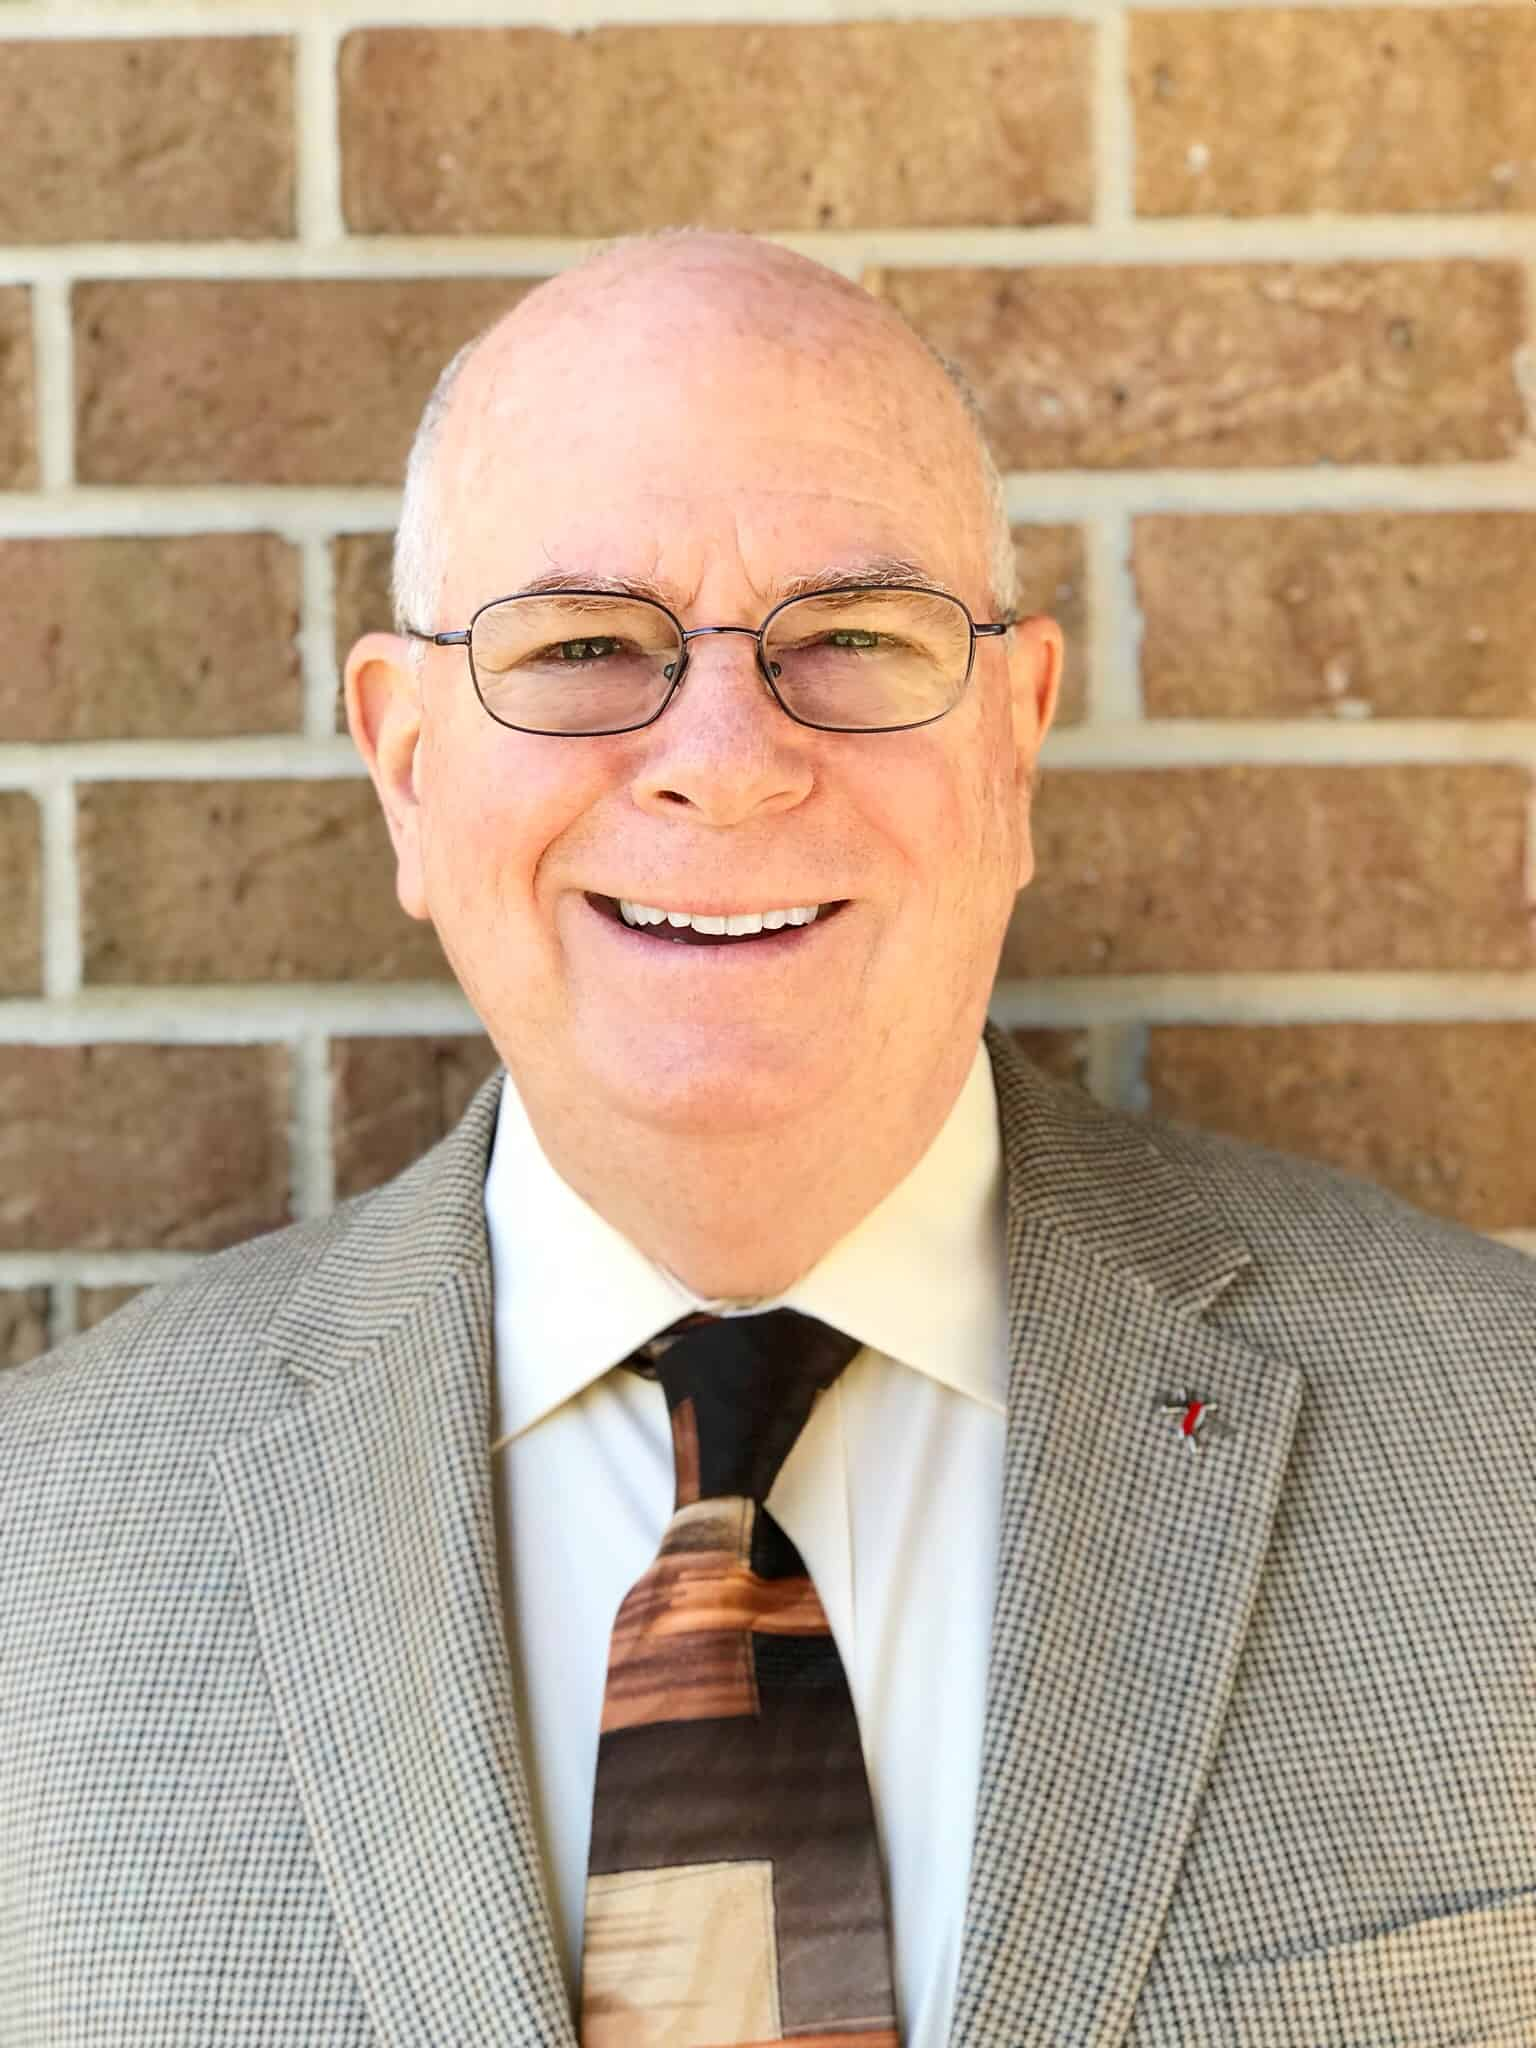 Deacon Dan McAuliffe